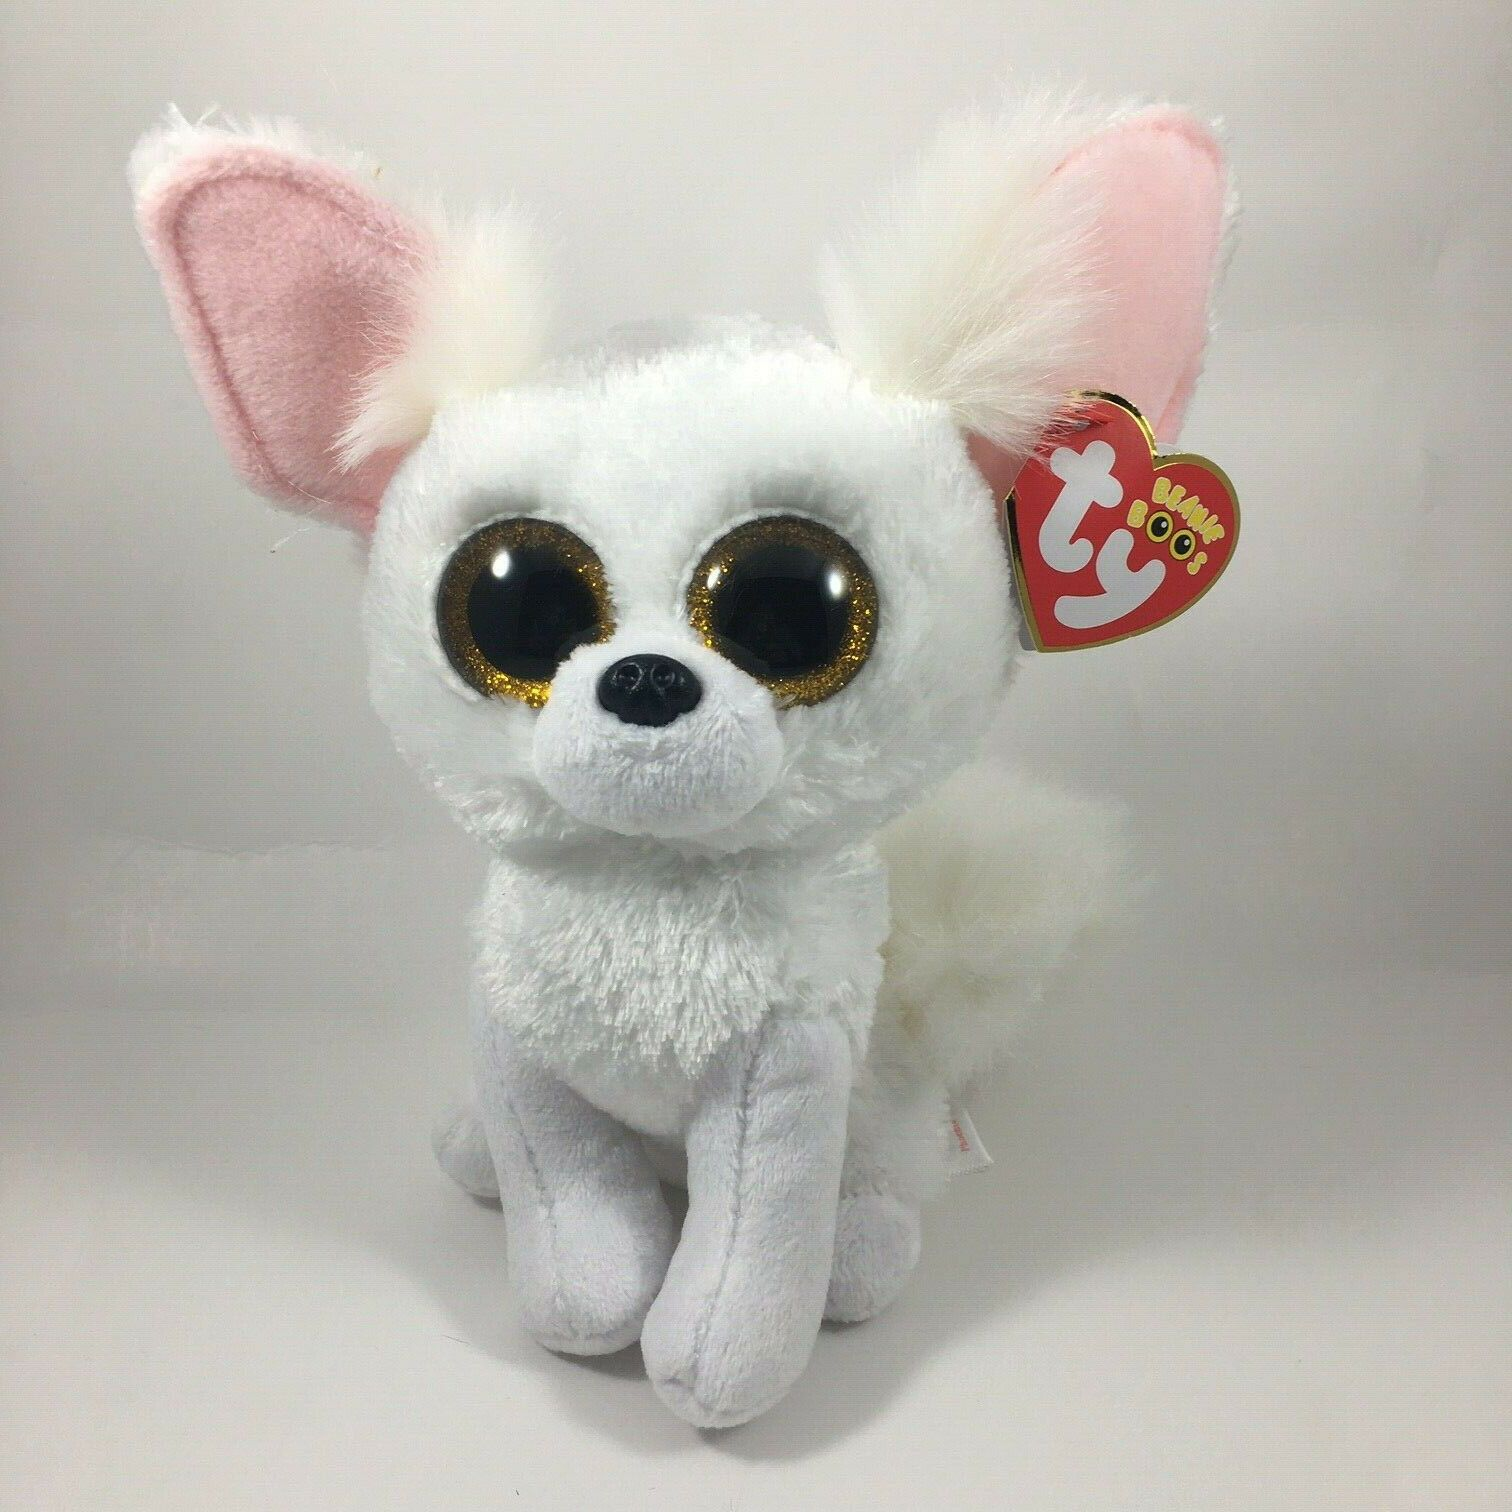 Details About 2020 Ty Beanie Boos 6 Phoenix White Fennec Fox